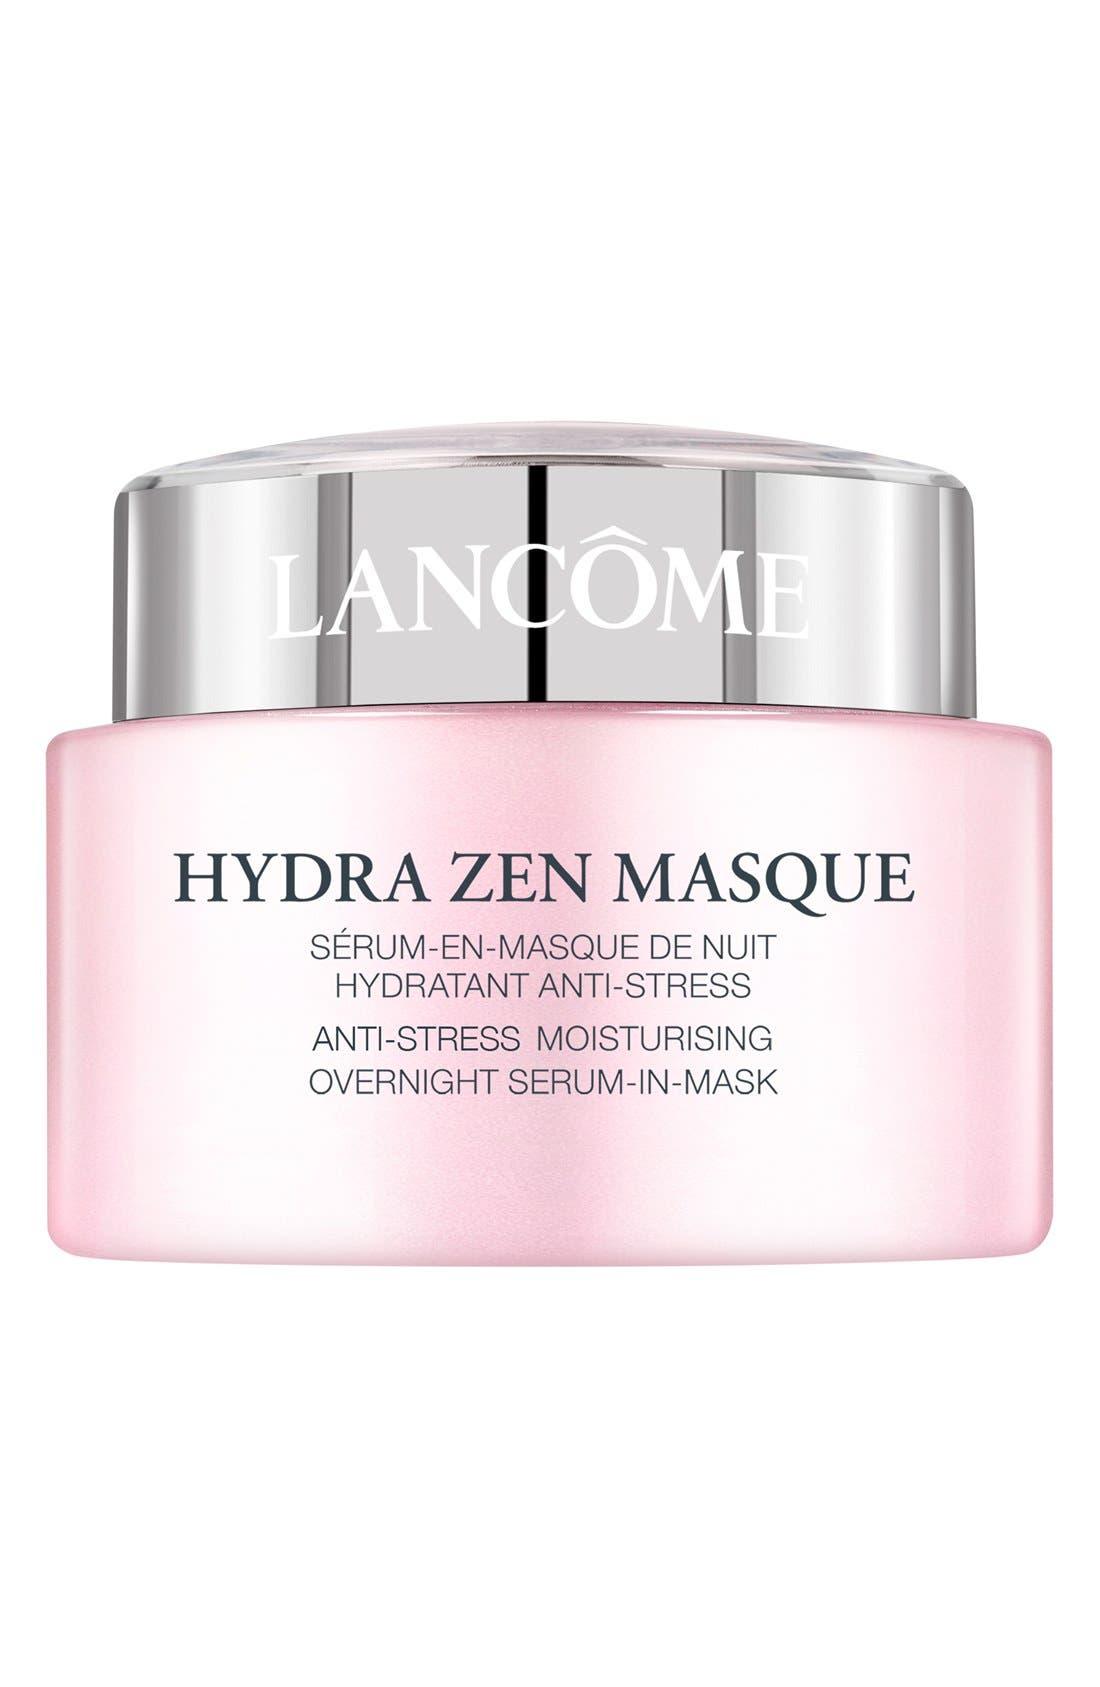 Hydra Zen Anti-Stress Moisturizing Overnight Serum-in-Mask,                             Main thumbnail 1, color,                             NO COLOR